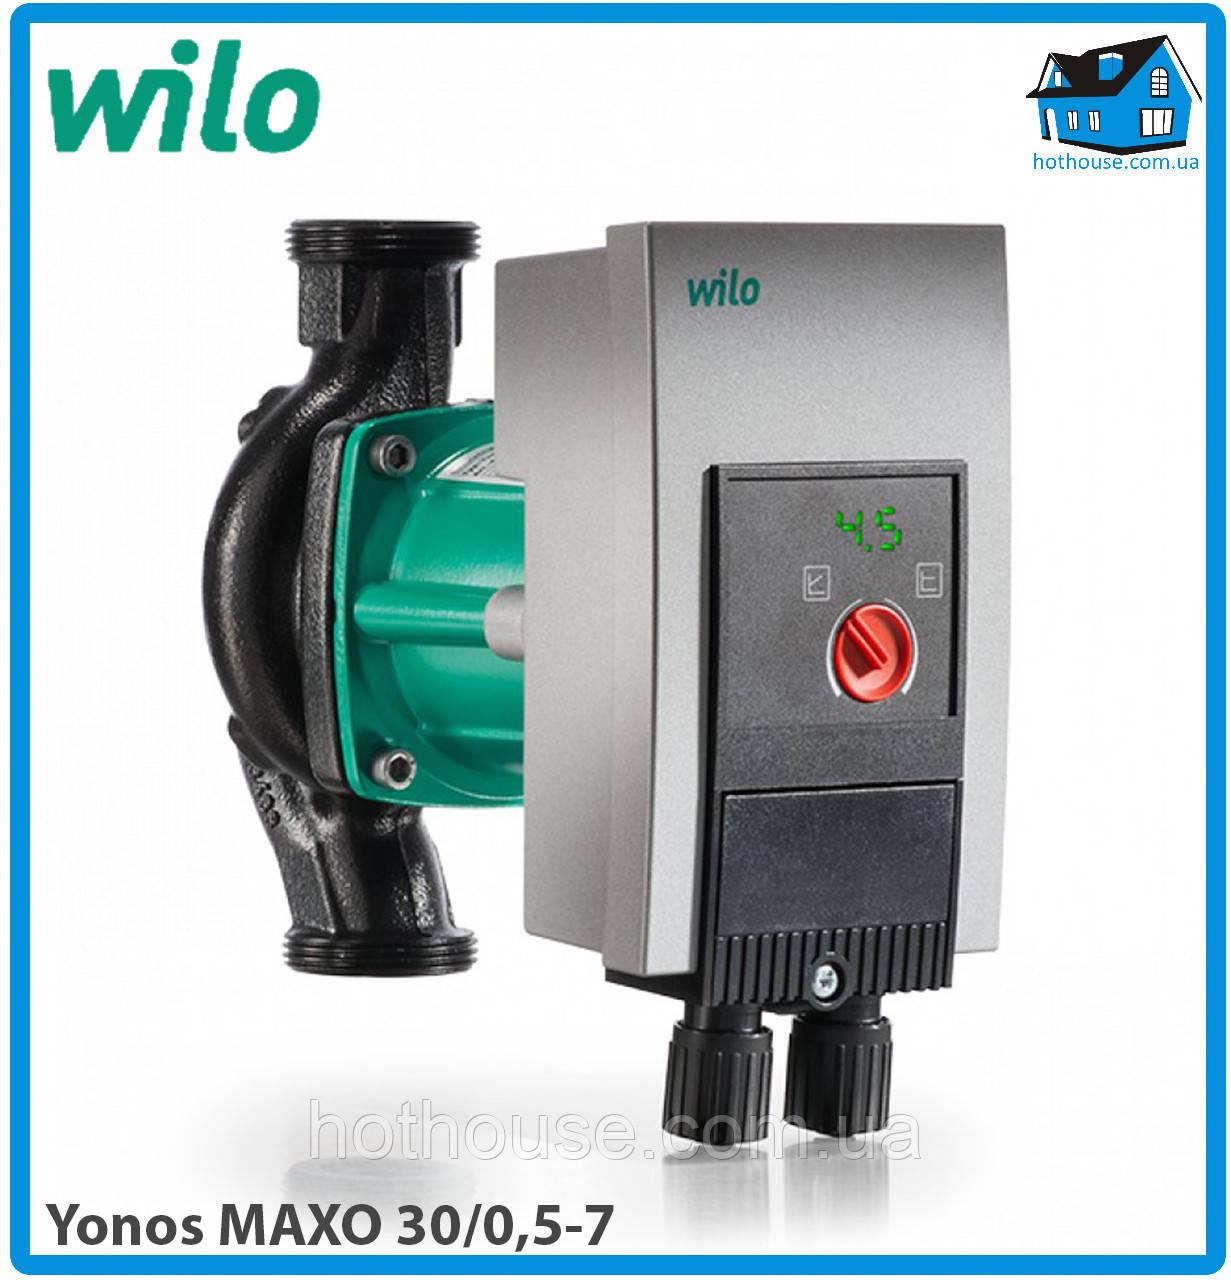 Насос циркуляционный Wilo Yonos MAXO 30/0,5-7 (оригинал)